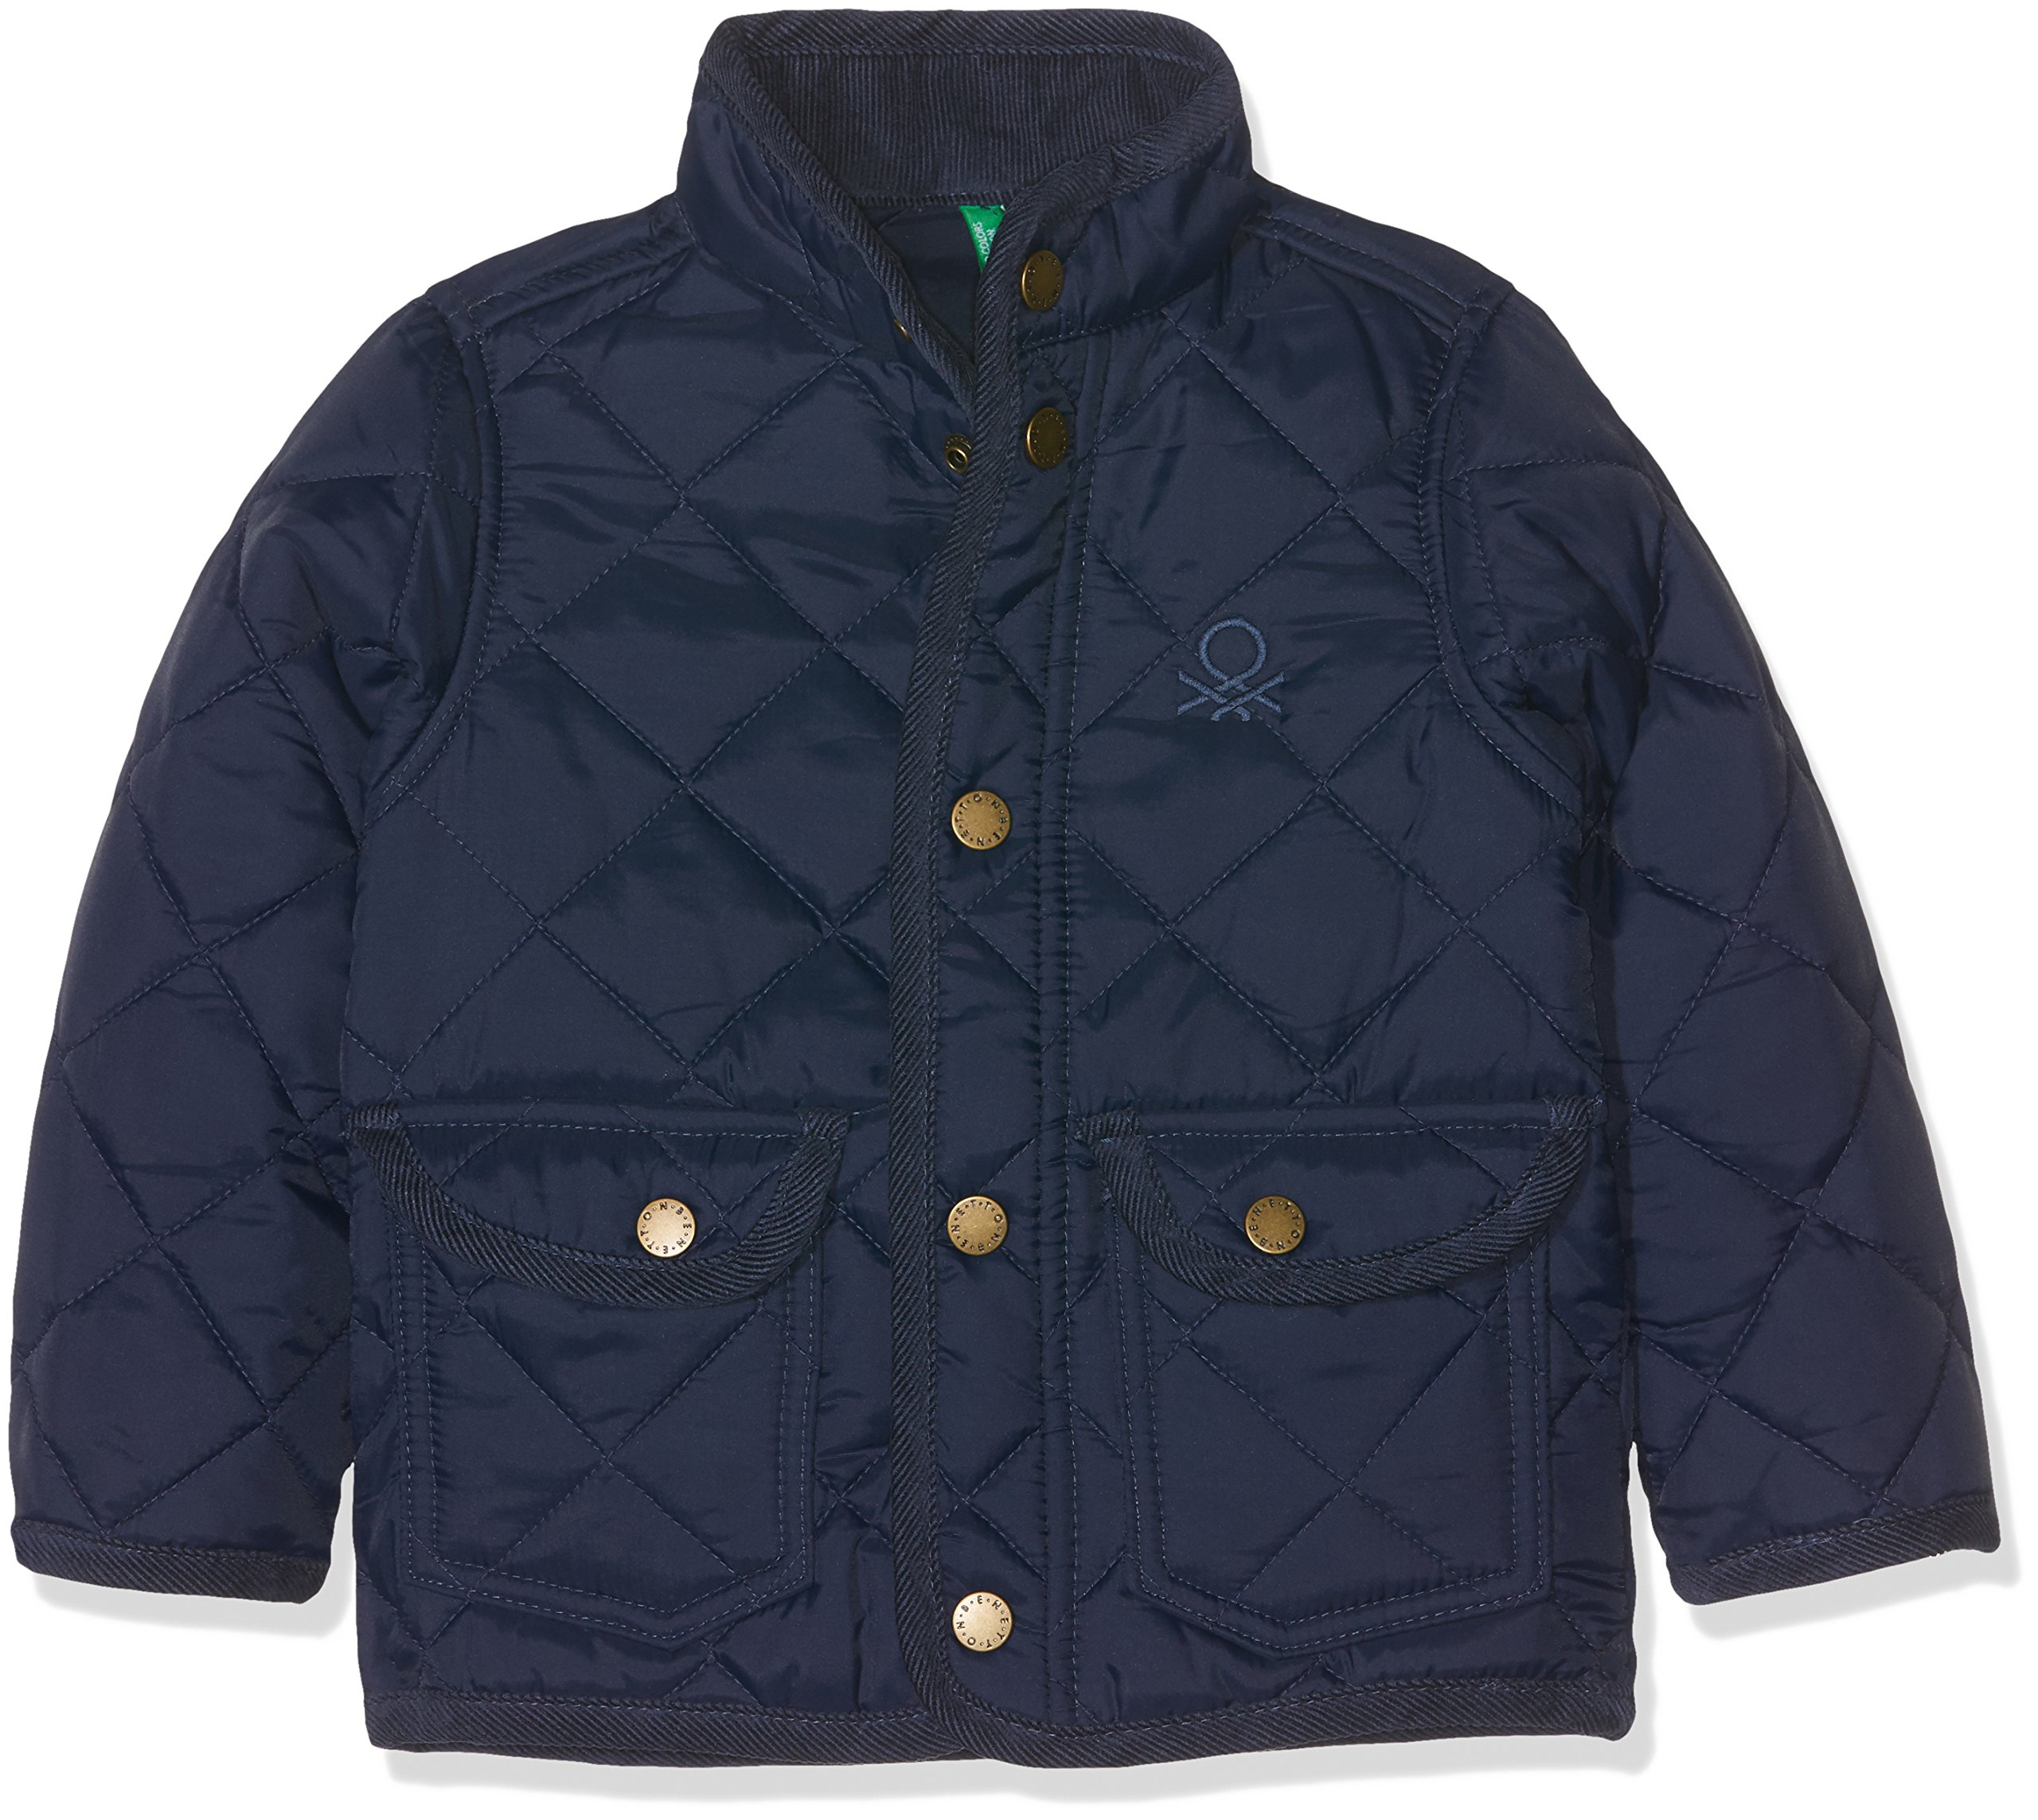 United Colors of Benetton Jacket Chaqueta para Niñas